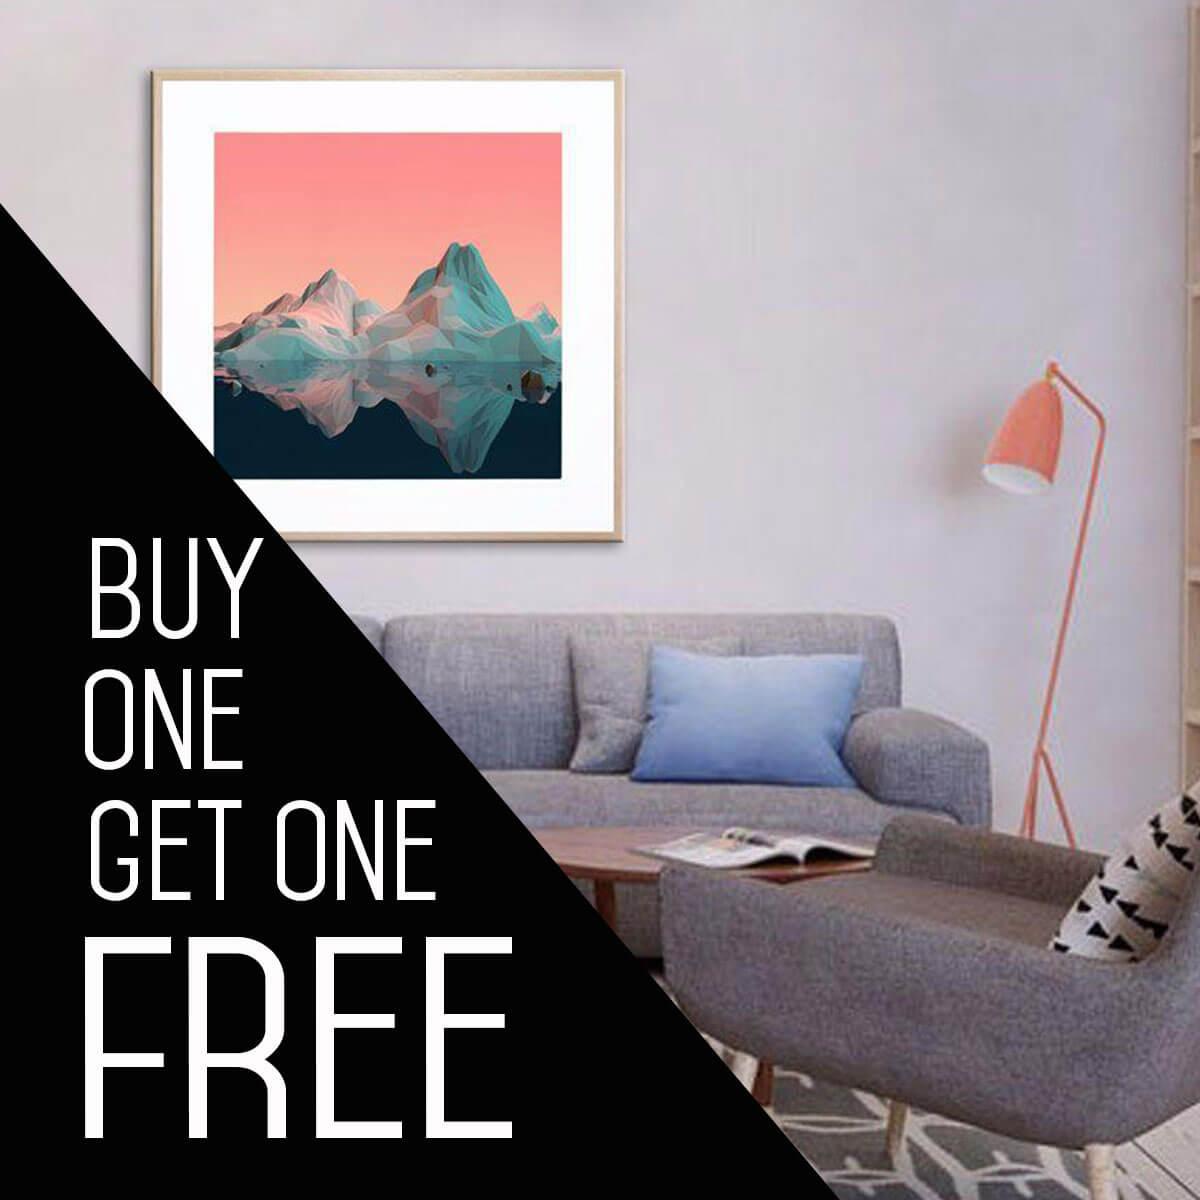 Buy Art & Hand Paintings, Canvas Prints, Wall Hangings ...